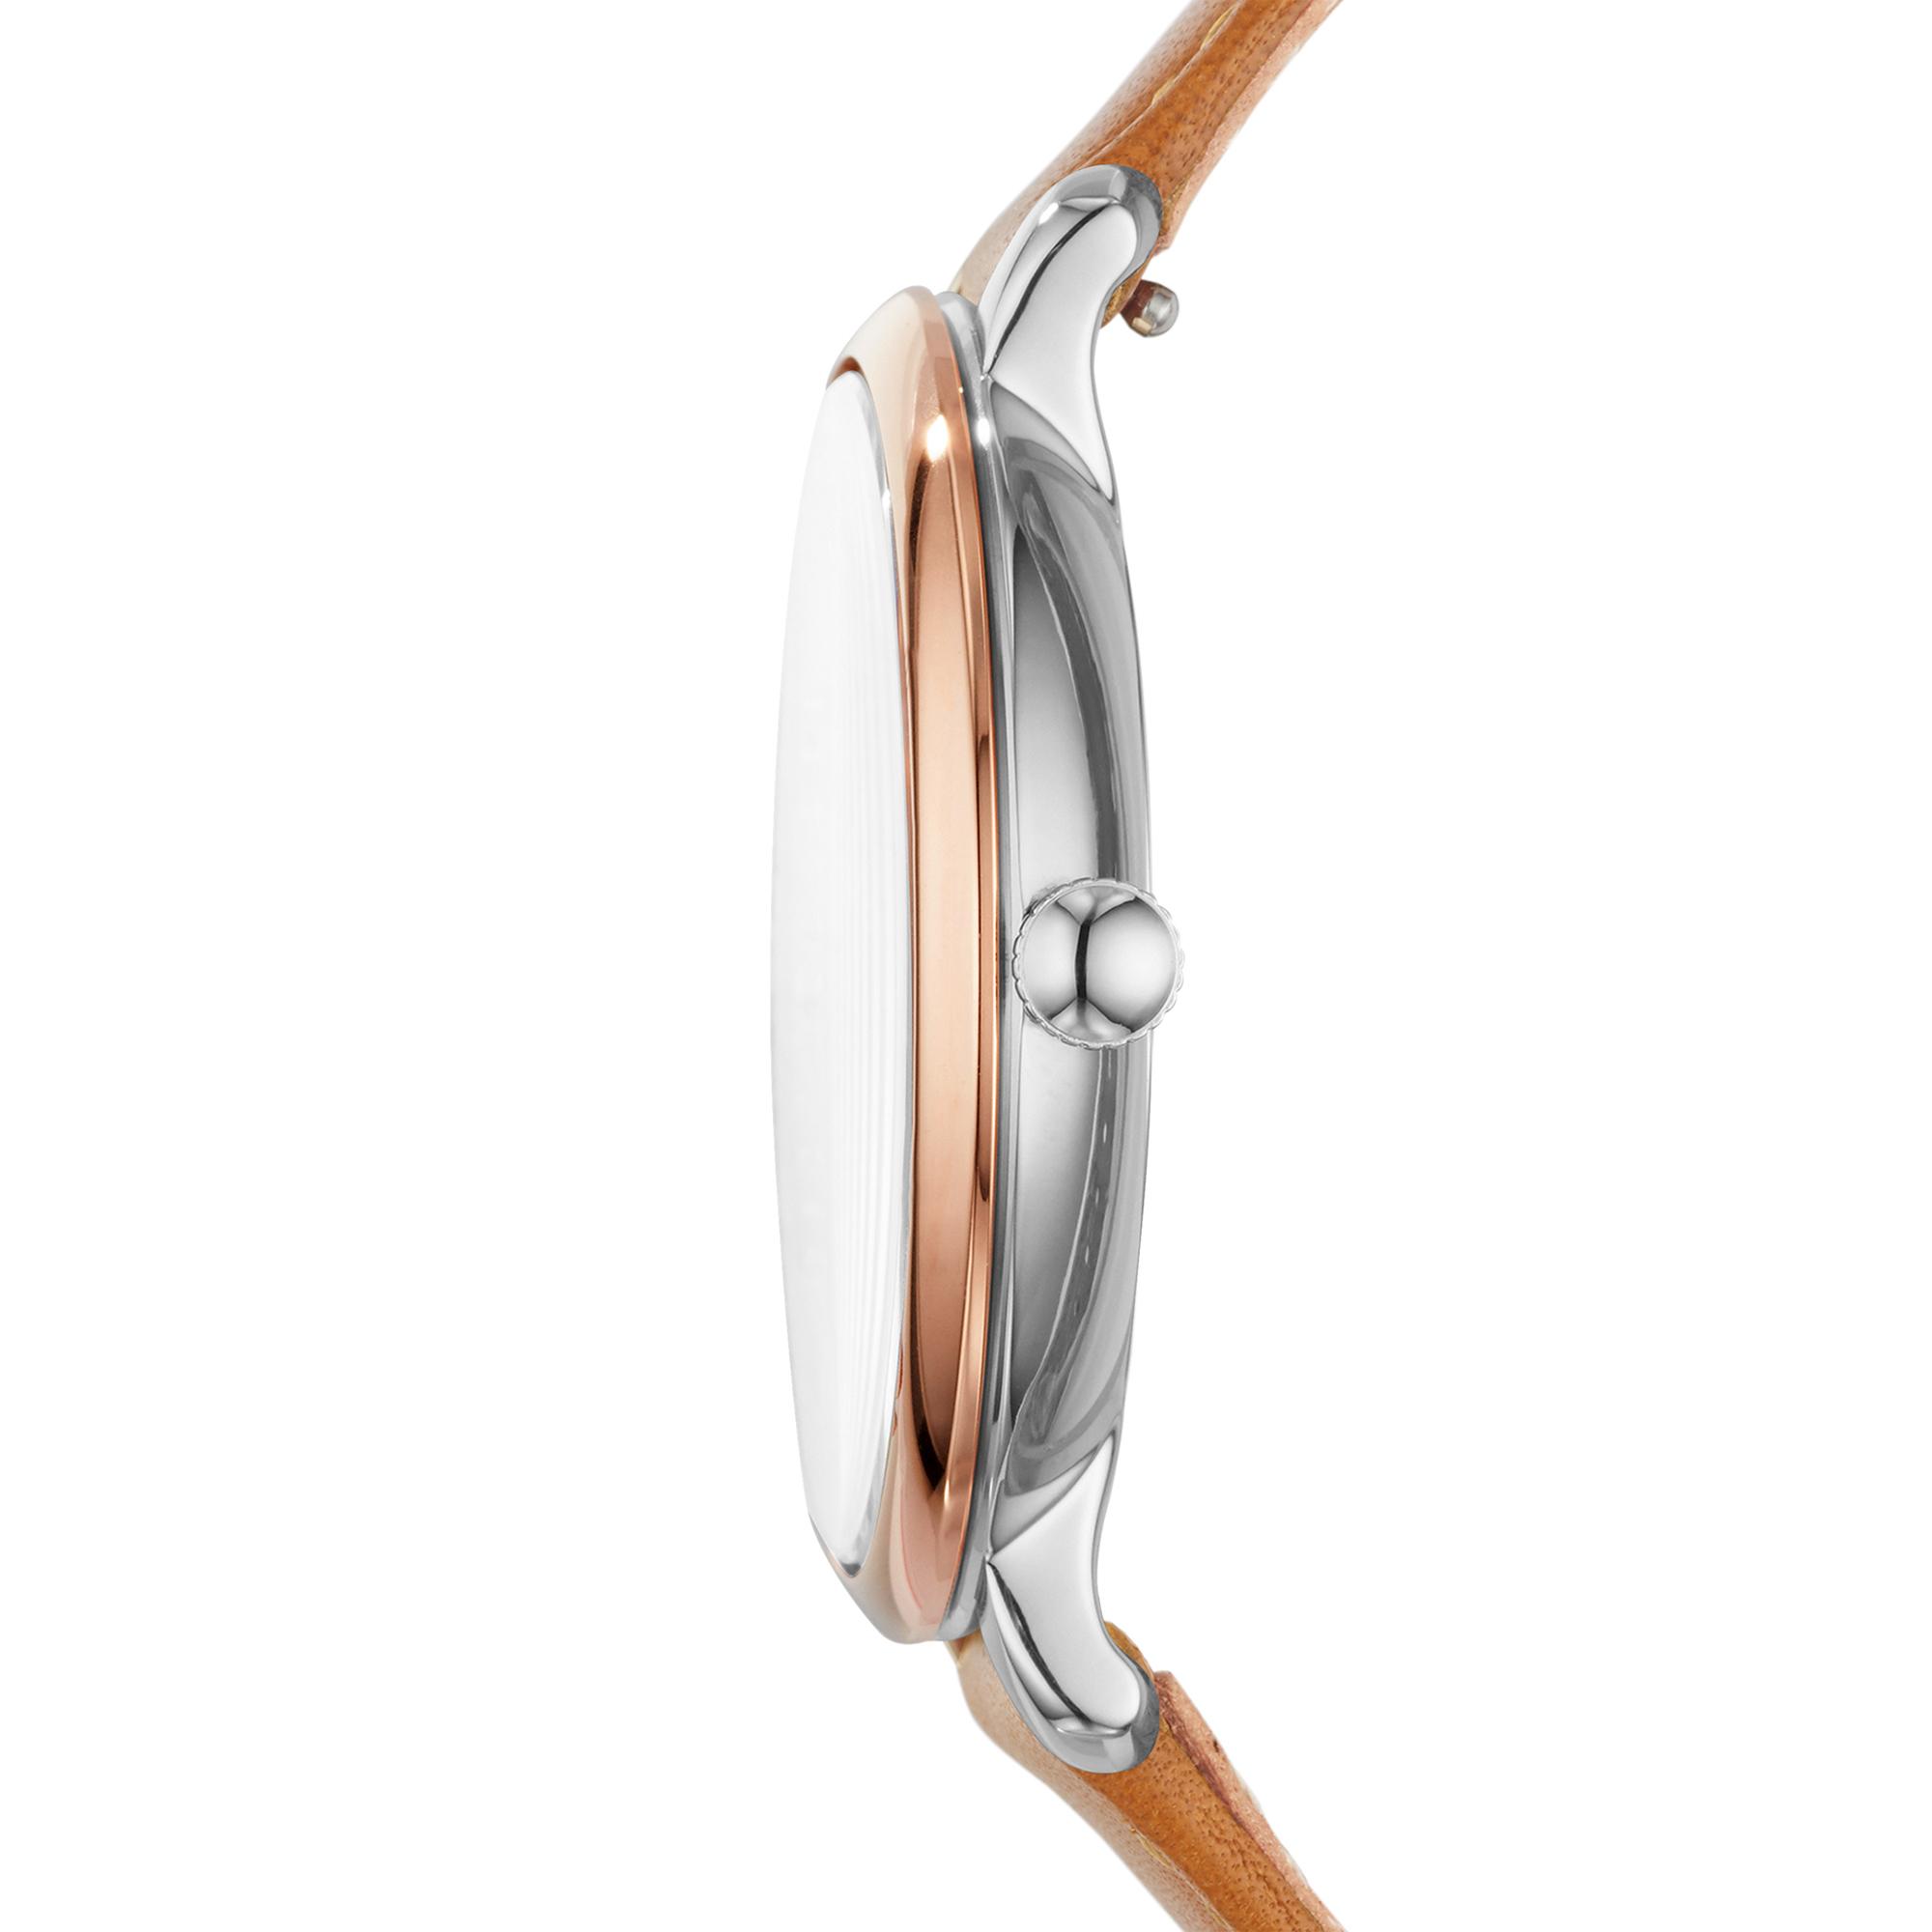 Đồng hồ Nữ Fossil dây da ES4274